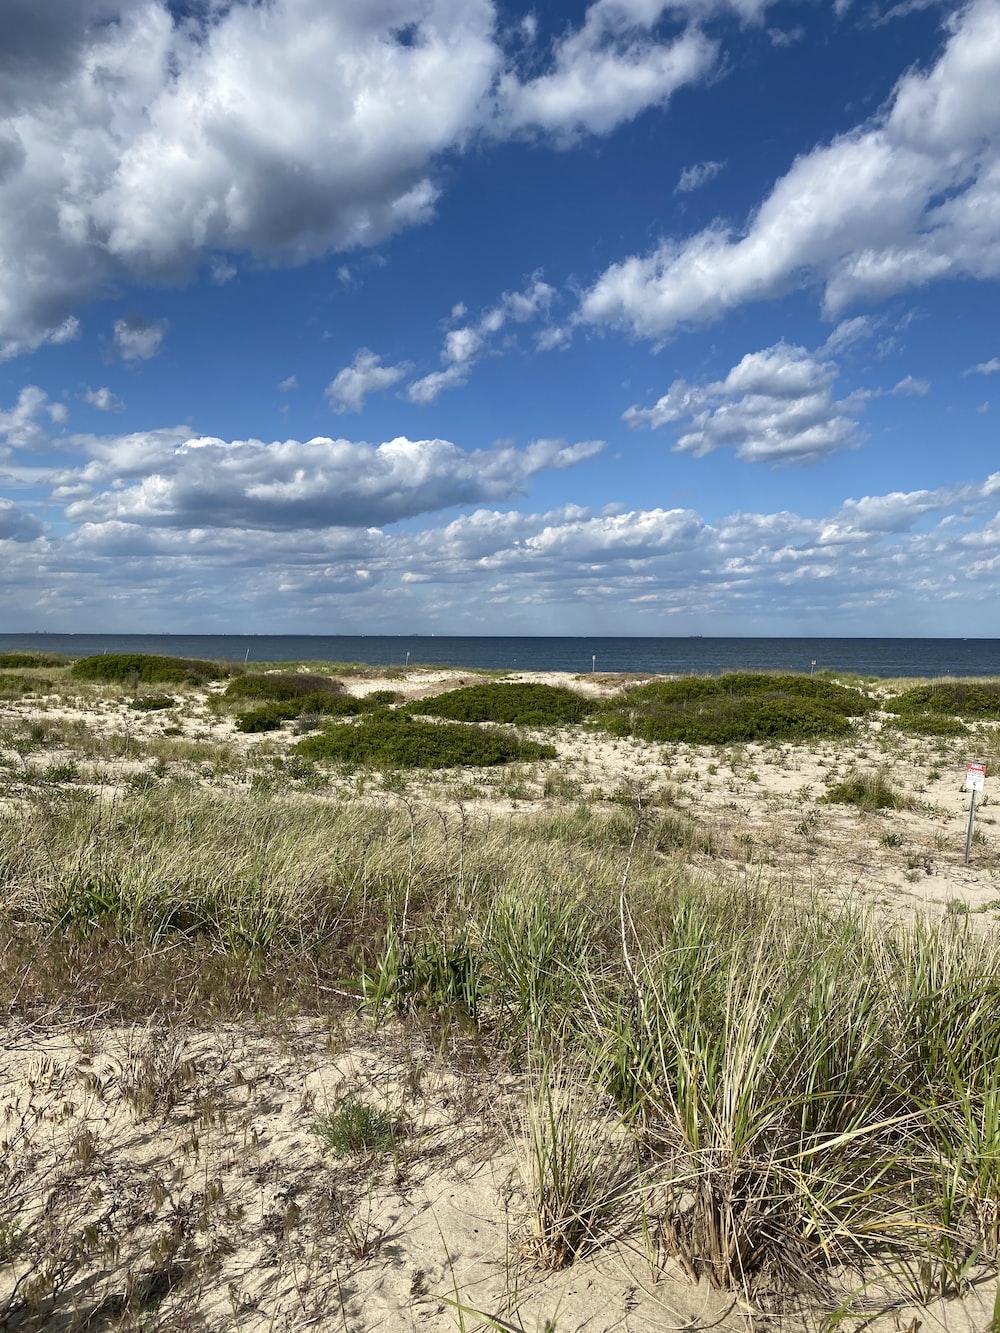 green grass on beach under blue sky during daytime